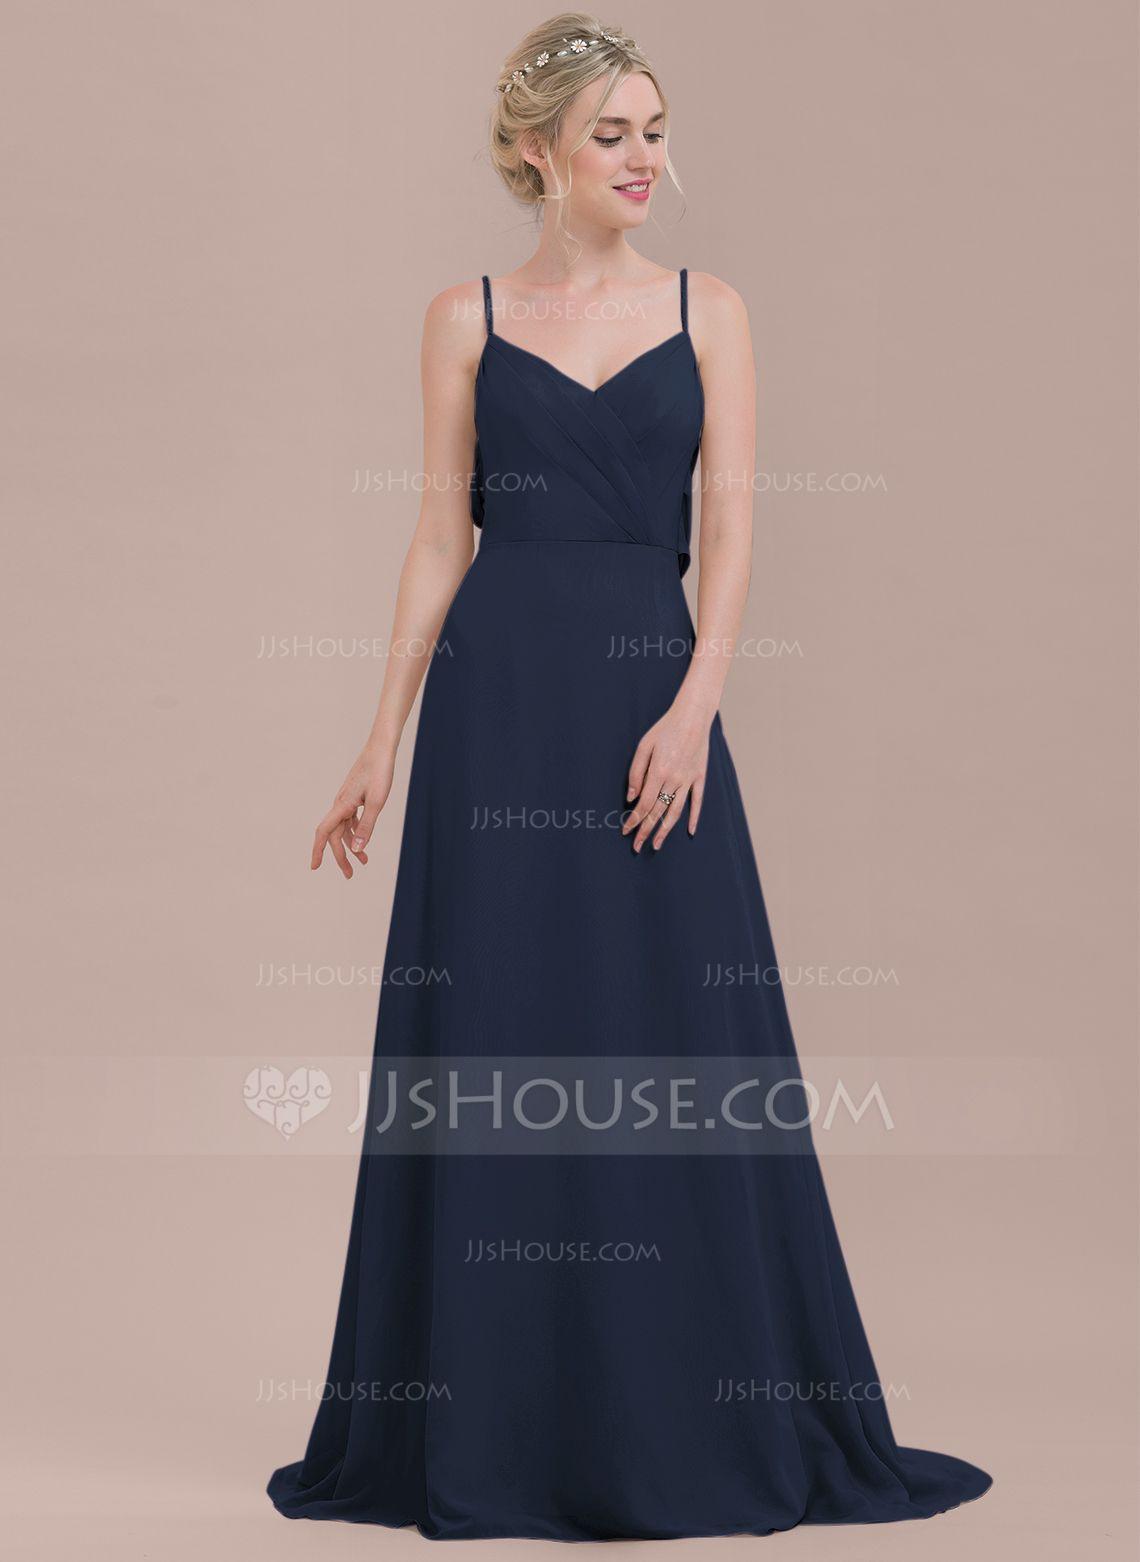 Designer Genial J J Abendkleider ÄrmelAbend Genial J J Abendkleider Spezialgebiet